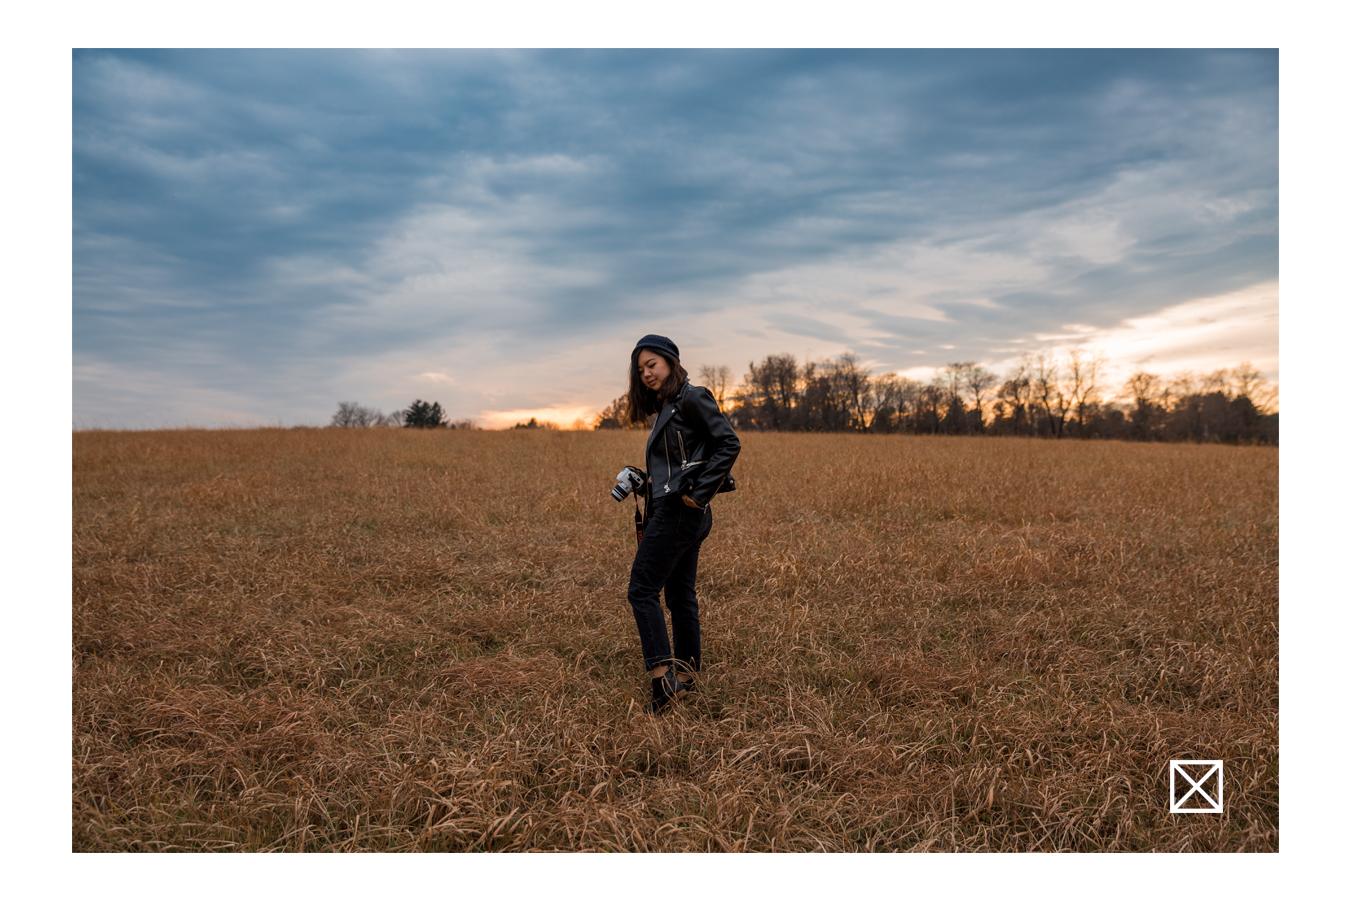 Noel_Zheng_Tony_Ward_University_of_Pennsylvania_Photography_Fashion_Editorial_Ad_Campaign_Avante_Garde_Photoshoot_Travel_Lifestyle_Danielle_Goh_Karen_Yang_Justin_Yue_Nadia_Kim_6